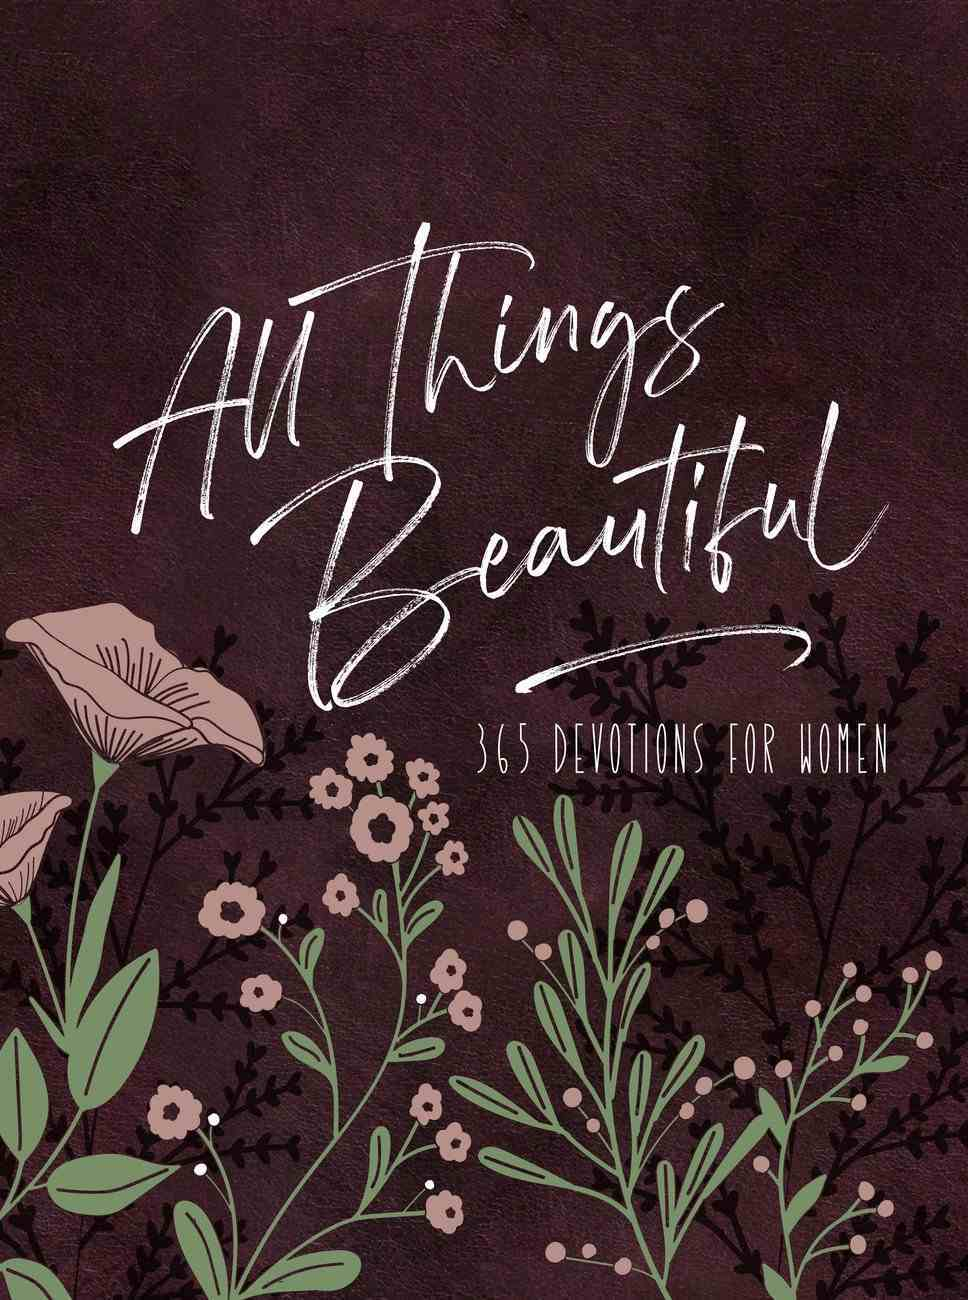 All Things Beautiful: 365 Daily Devotions (Ziparound) Imitation Leather